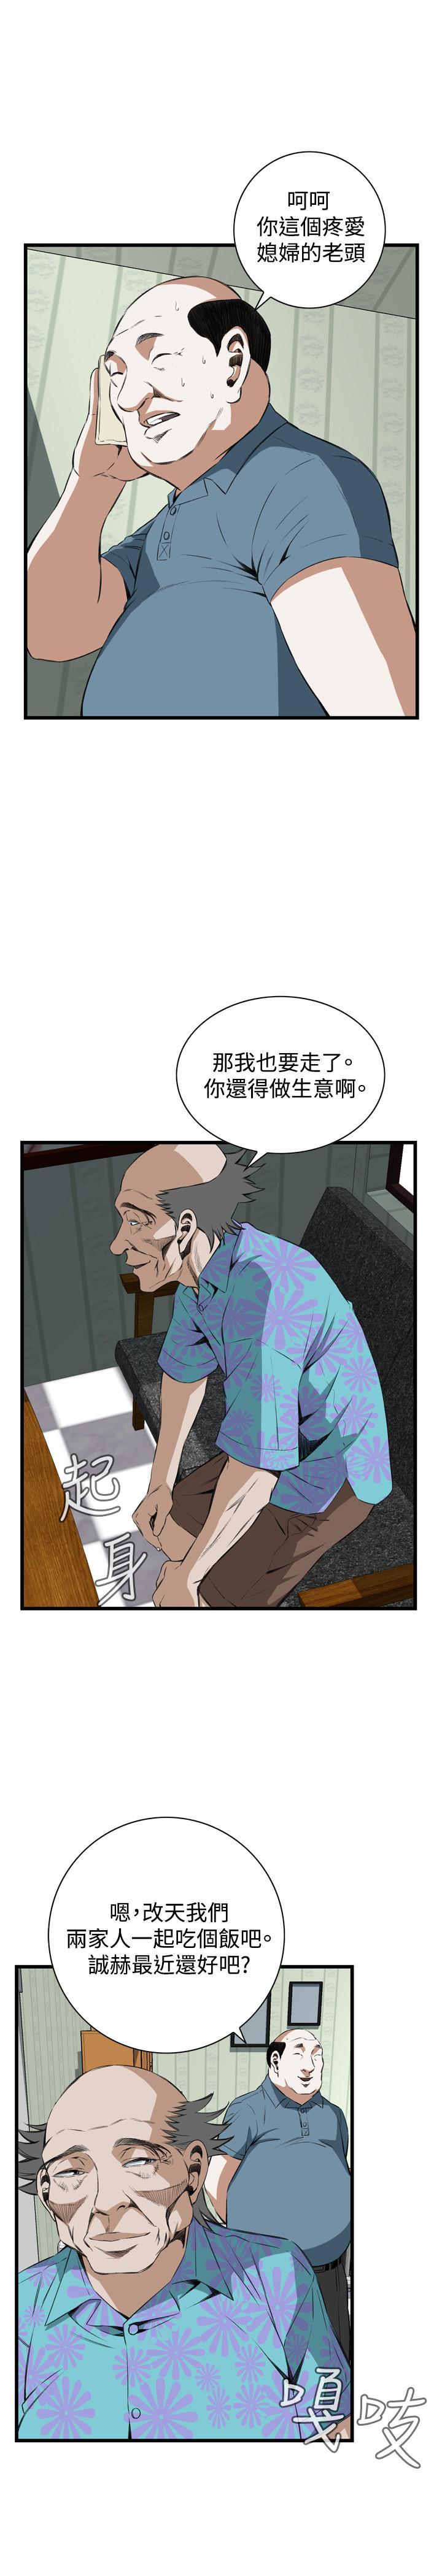 Take a Peek 偷窥 Ch.39~60 [Chinese]中文 631